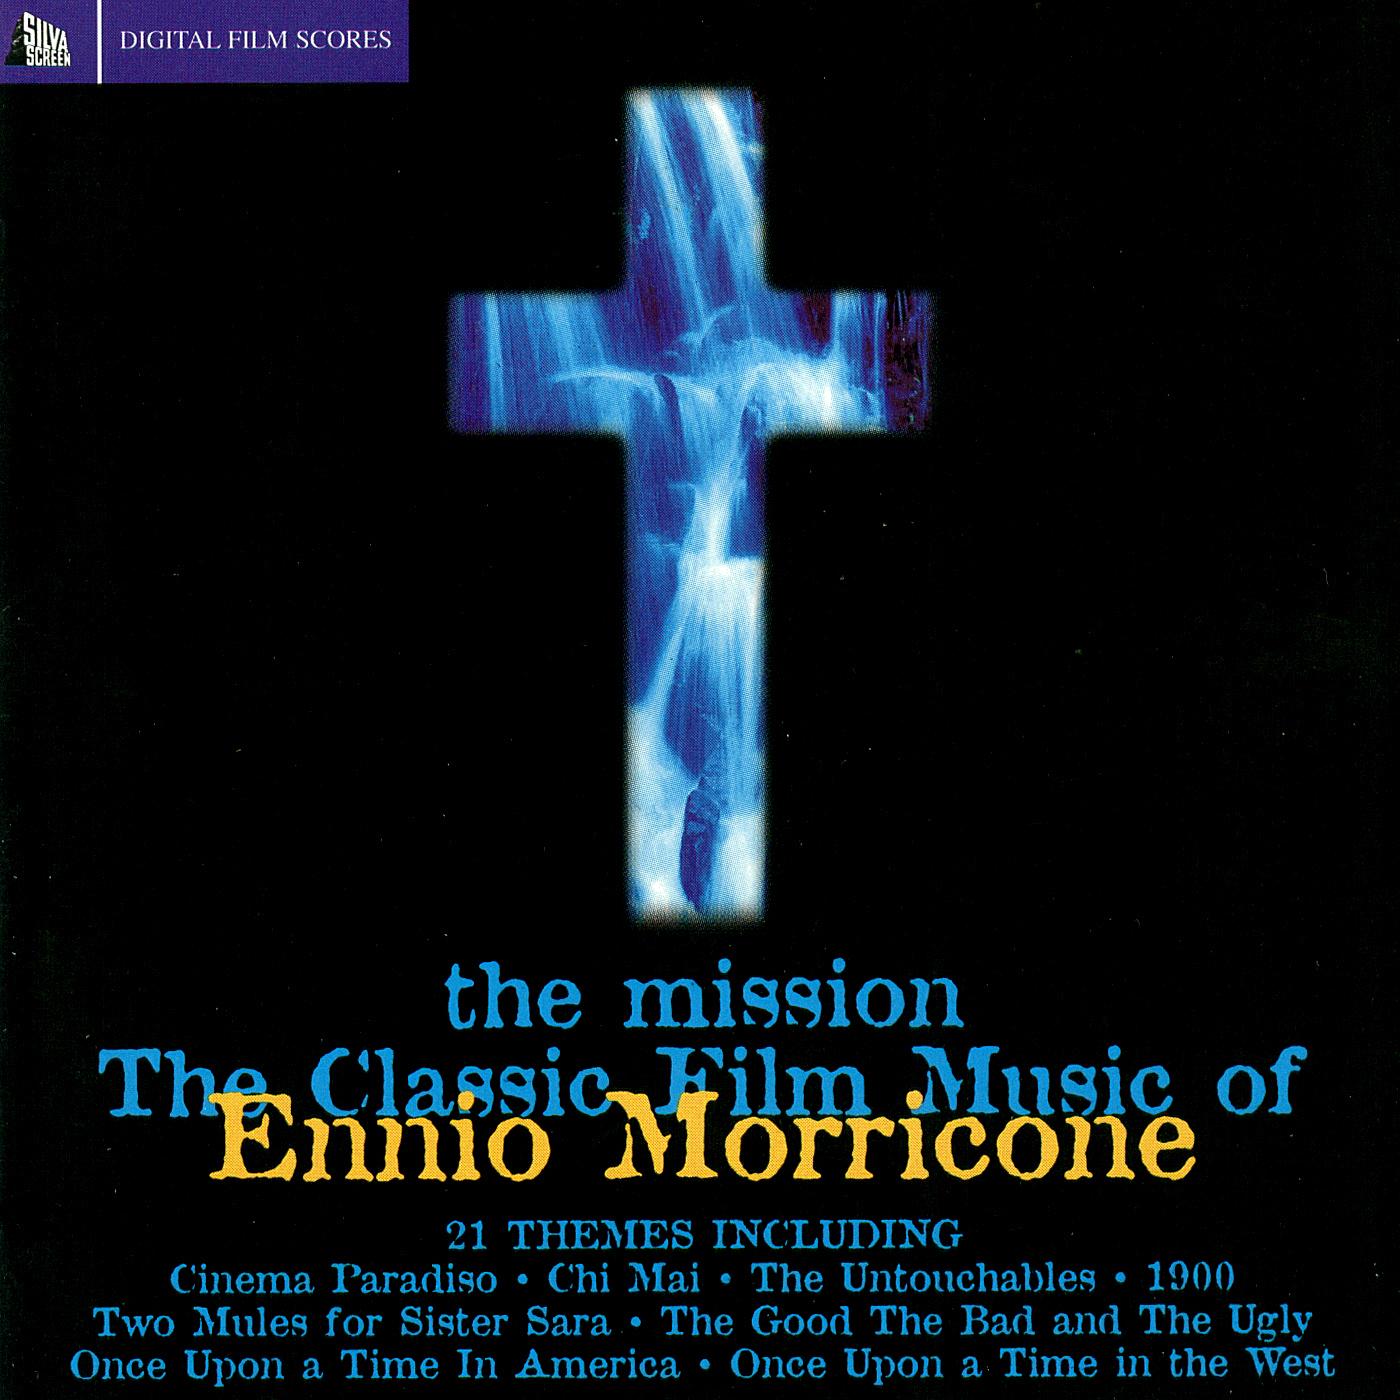 The Misson: Classic Film Music of Ennio Morricone